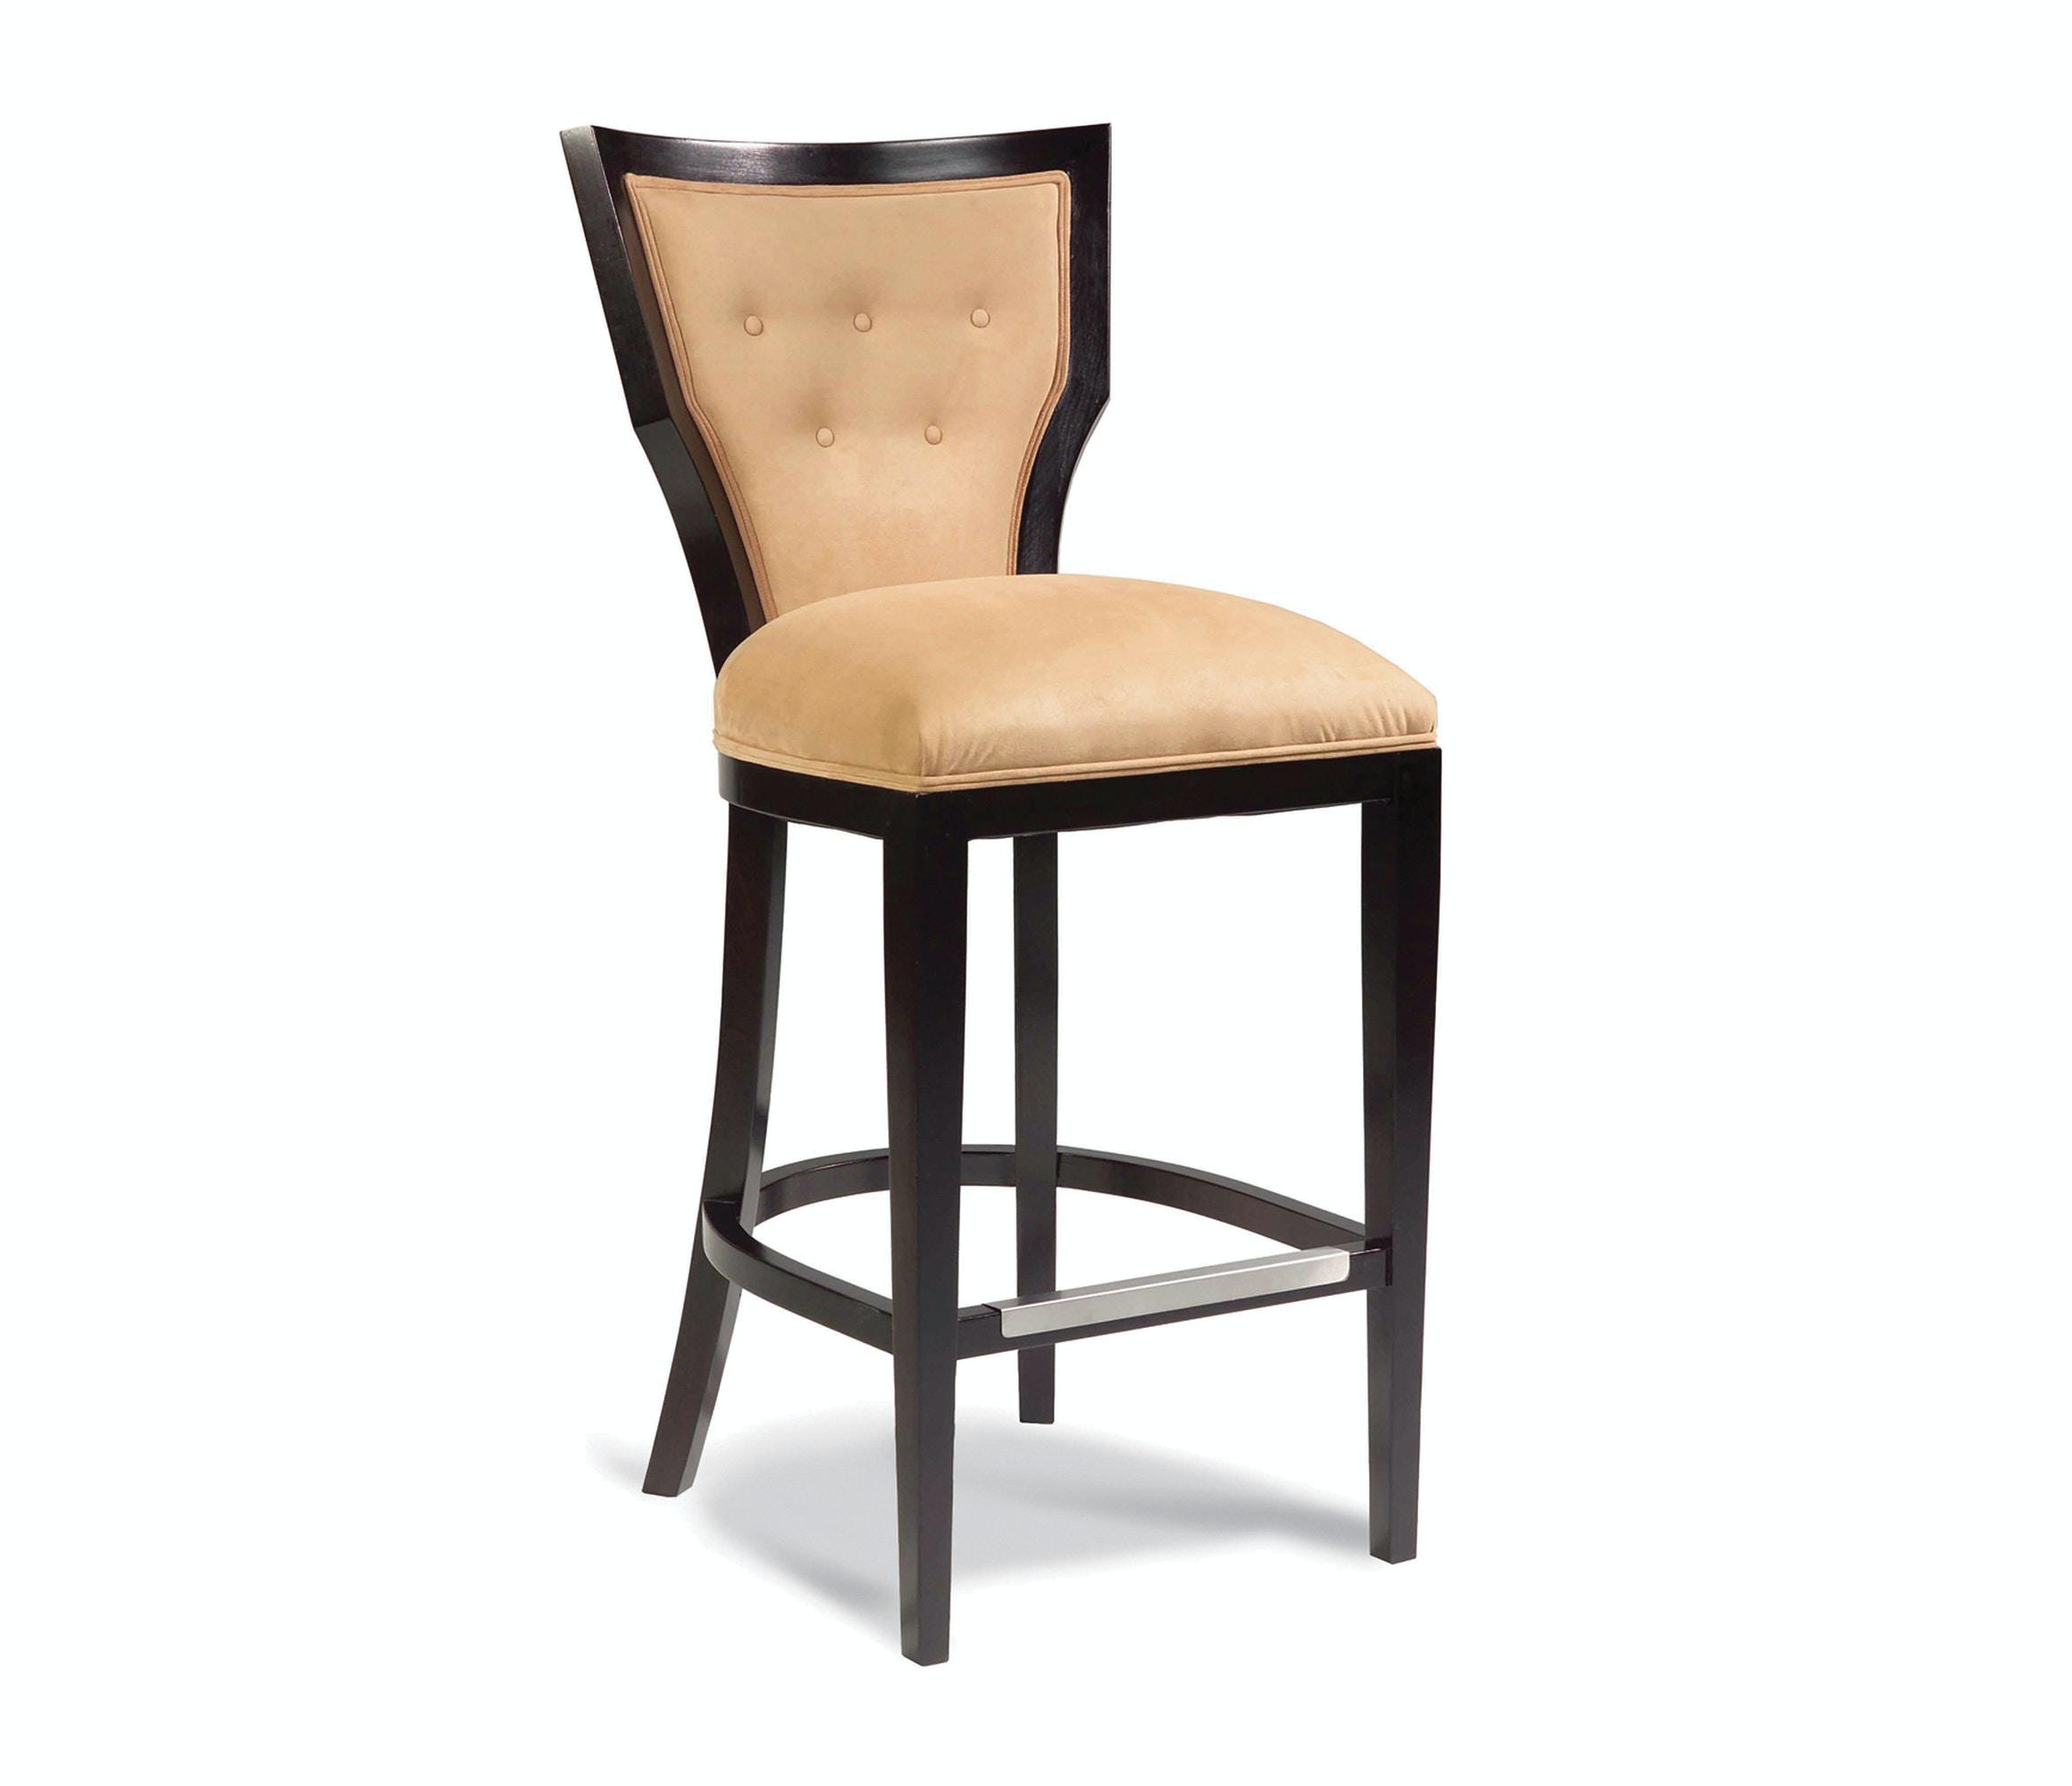 151. MERCER BAR STOOL · 151 · Taylor King Furniture